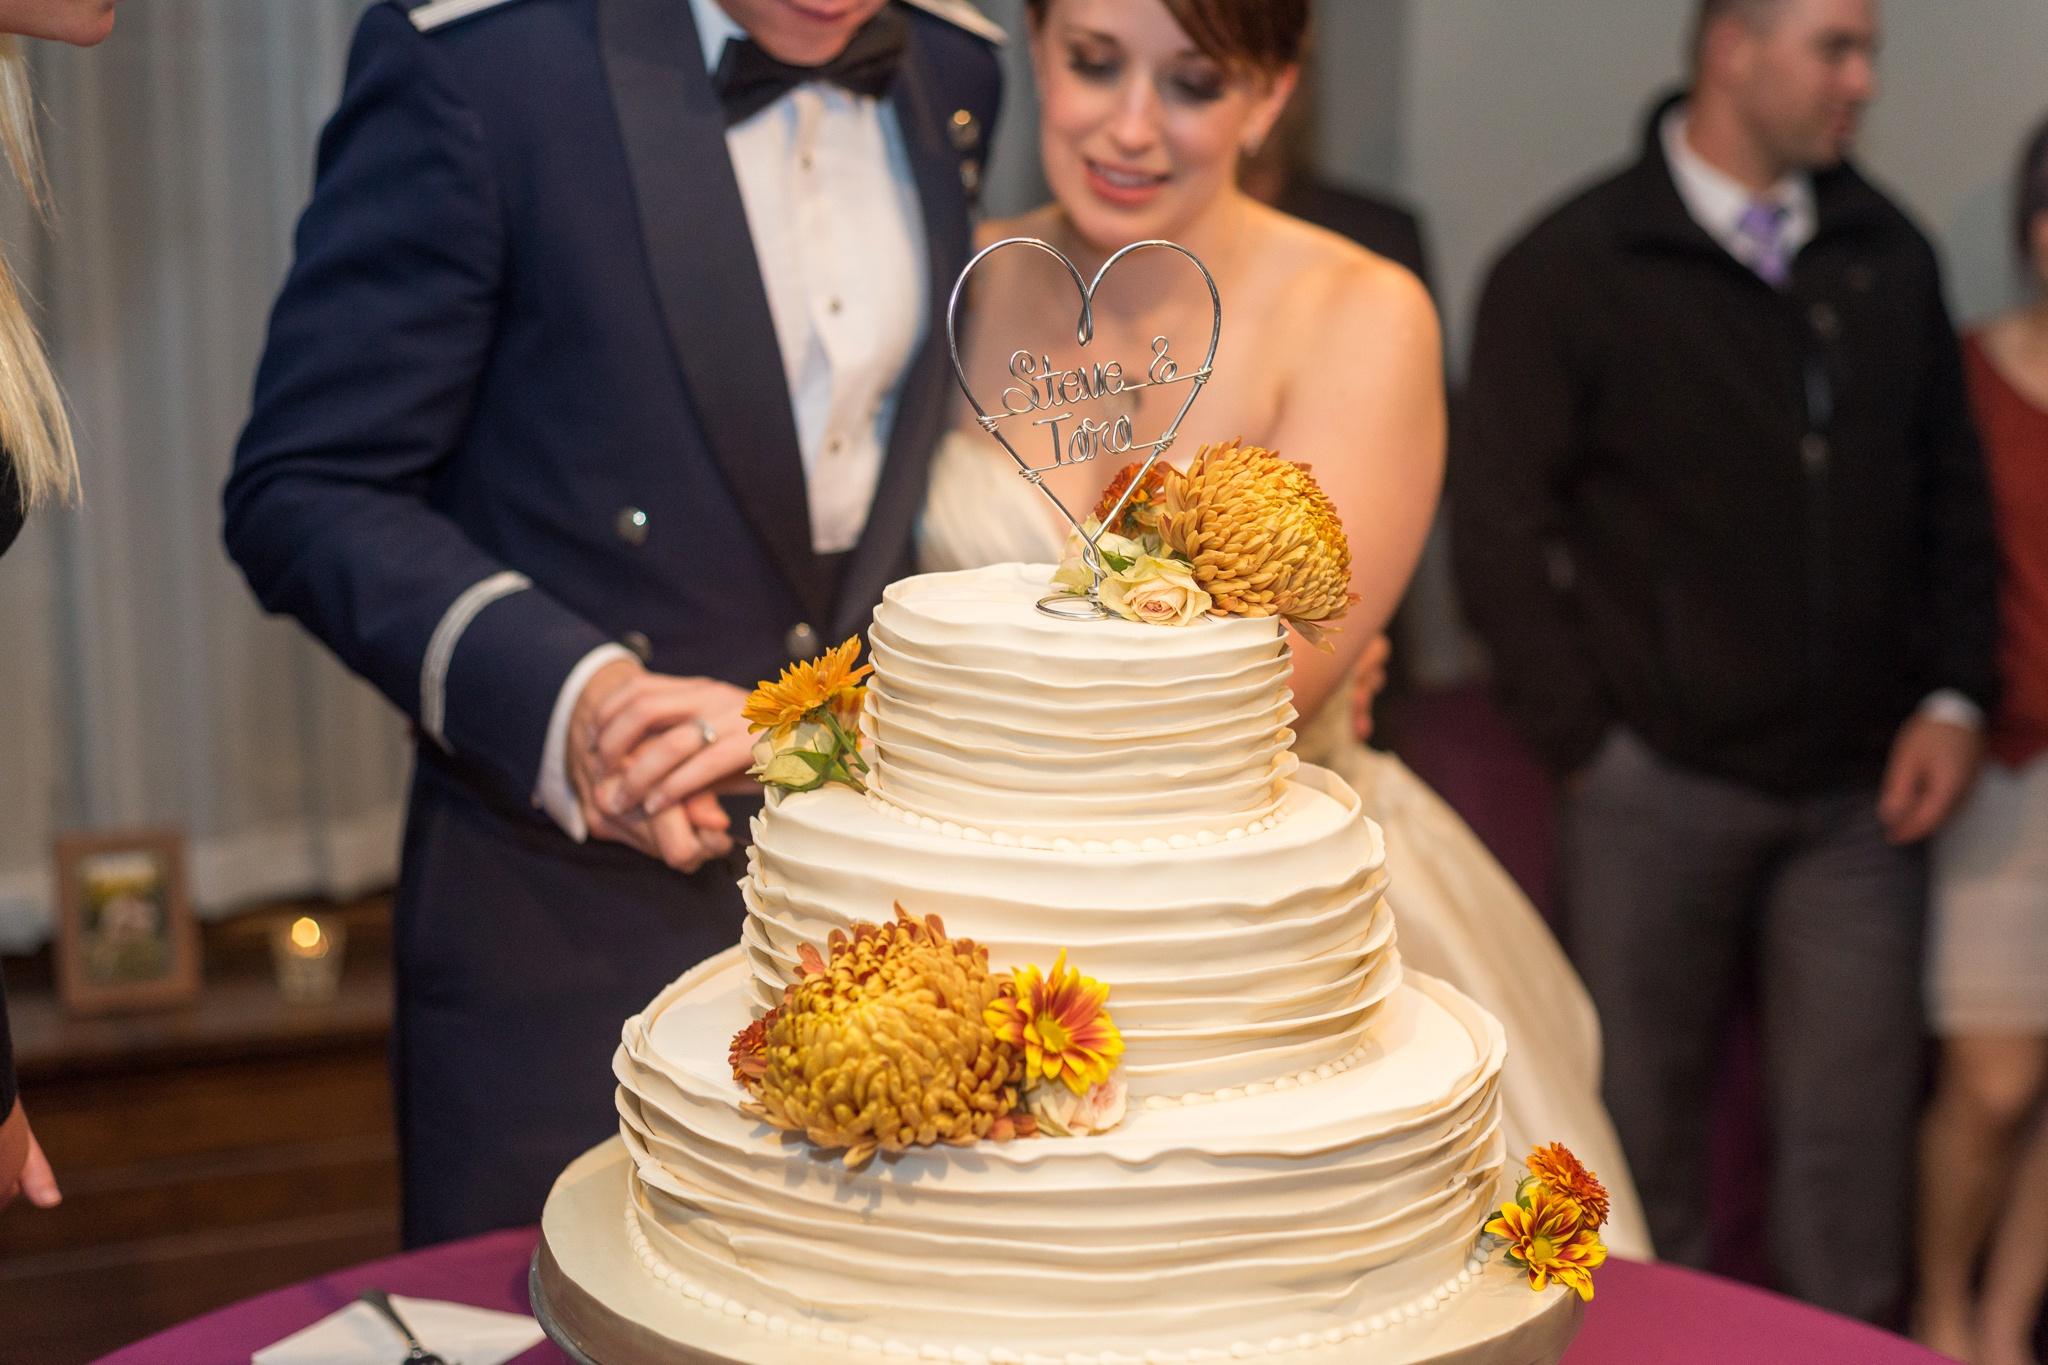 cjs-off-square-wedding-cake